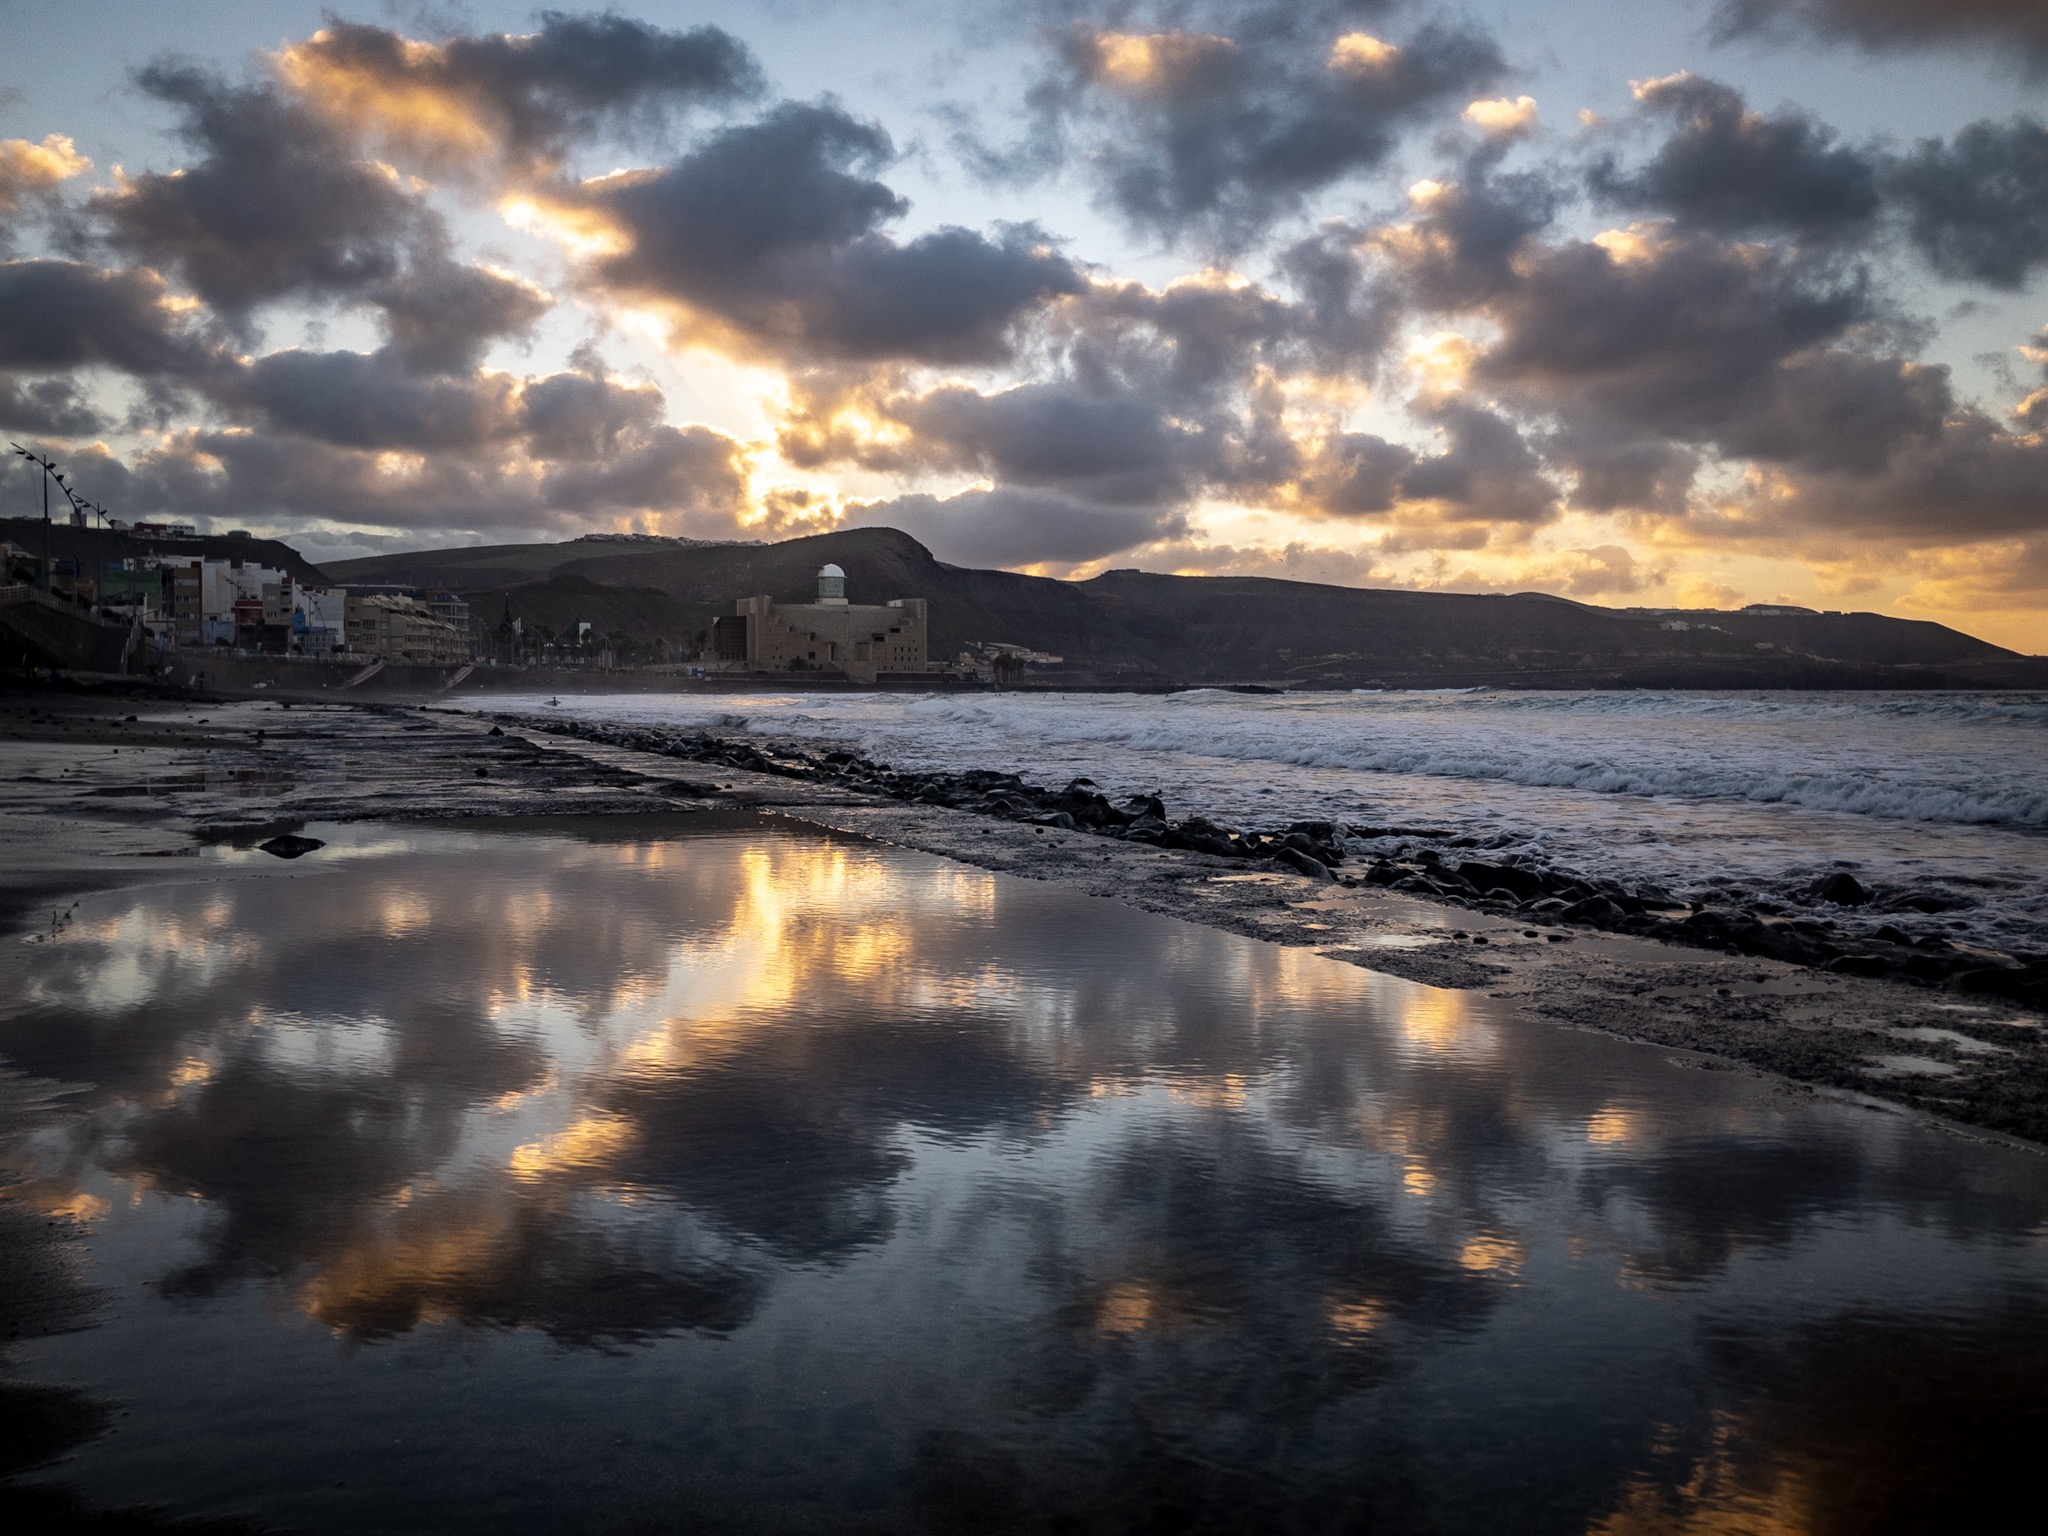 Salt water reflections, Spain